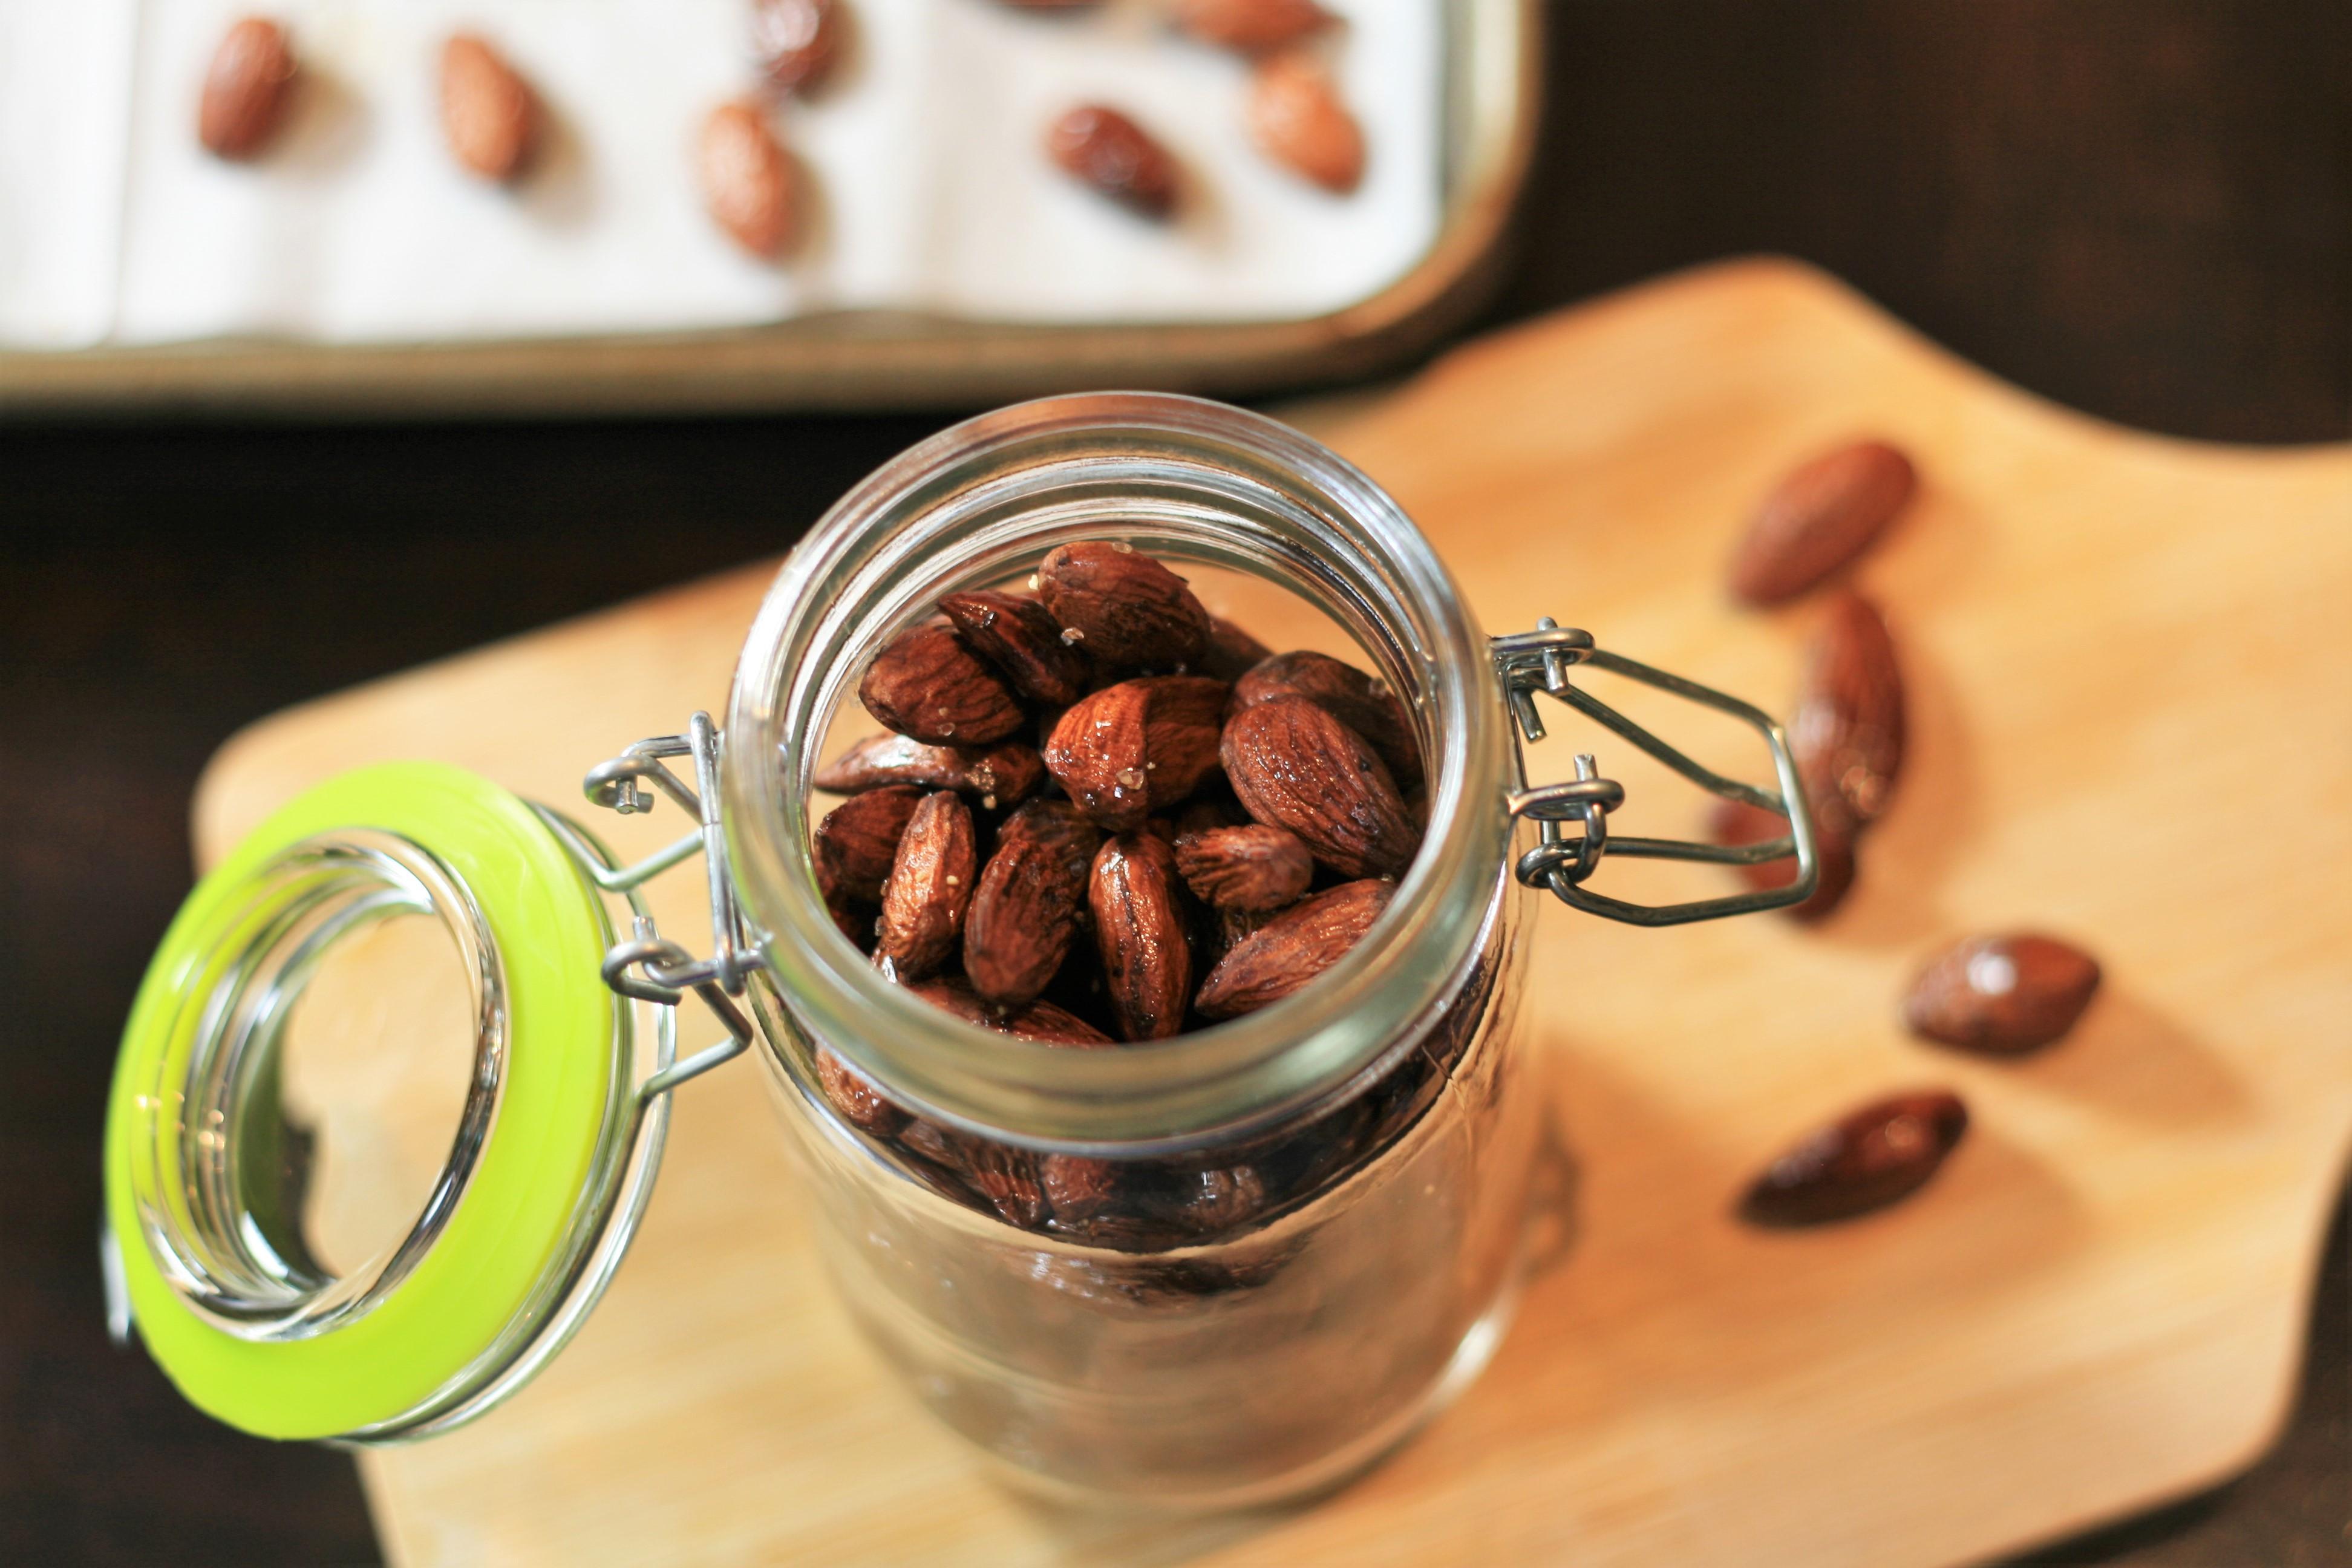 Salt and Vinegar Almonds